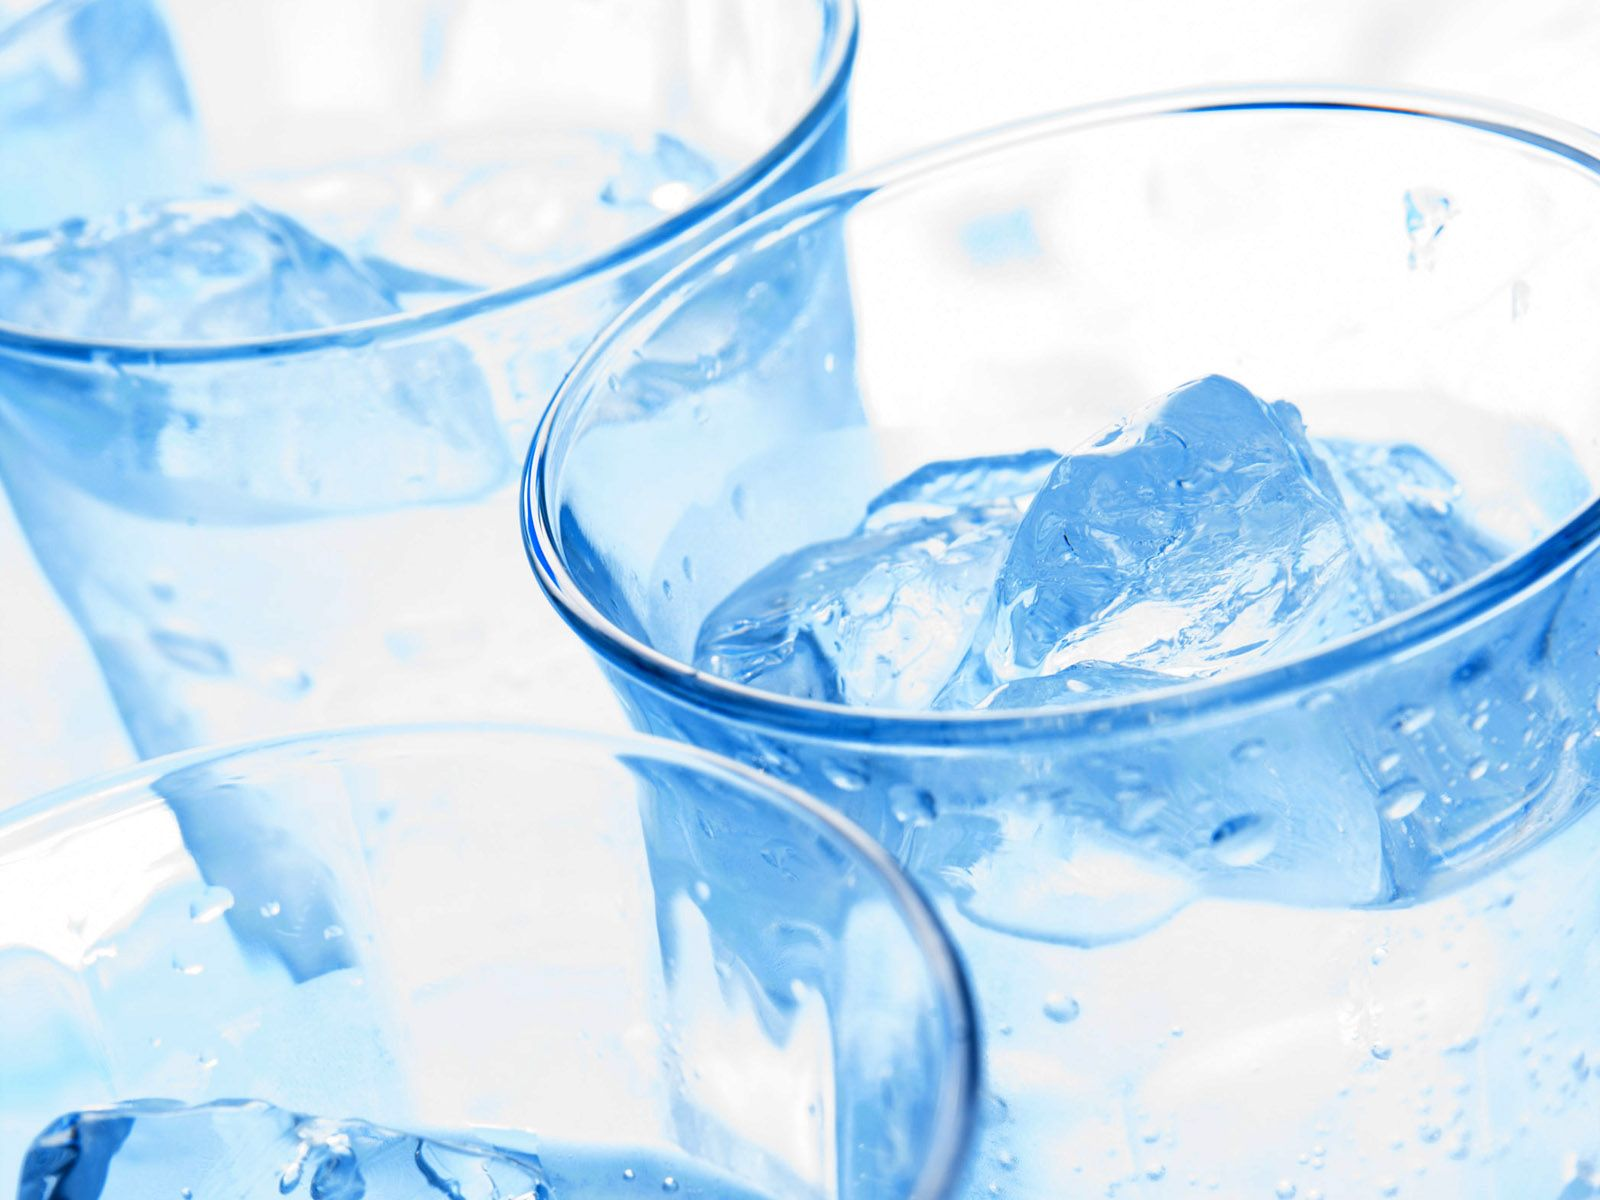 beber-agua-gelada-emagrece-8